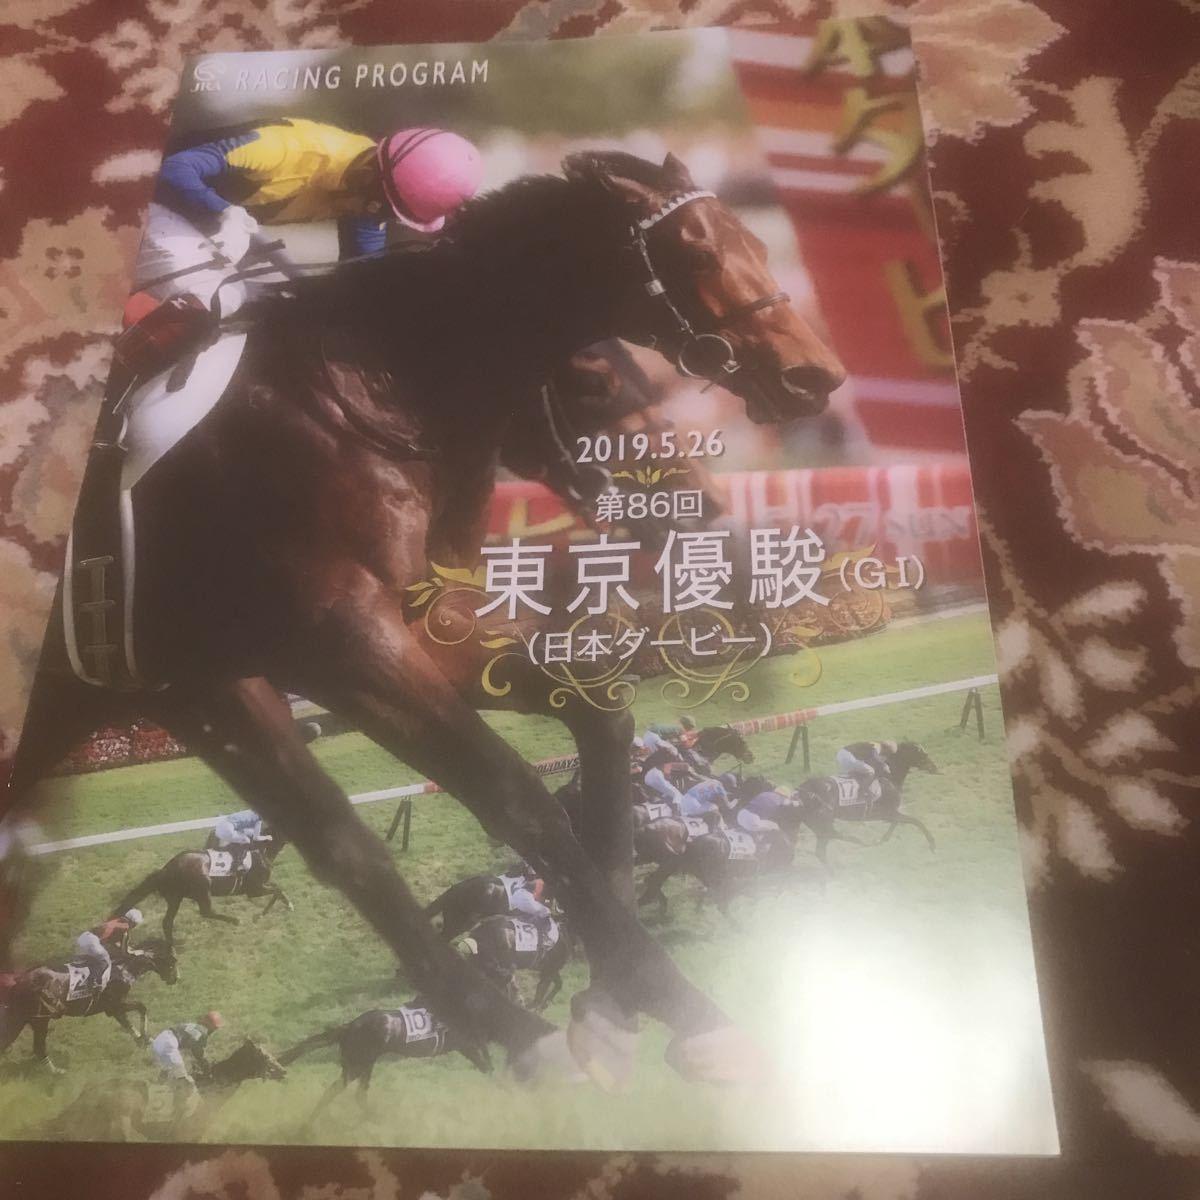 JRAレーシングプログラム2019.5.26(日)第86回東京優駿(日本ダービー)(GⅠ)、目黒記念(GⅡ)、安土城ステークス_画像1